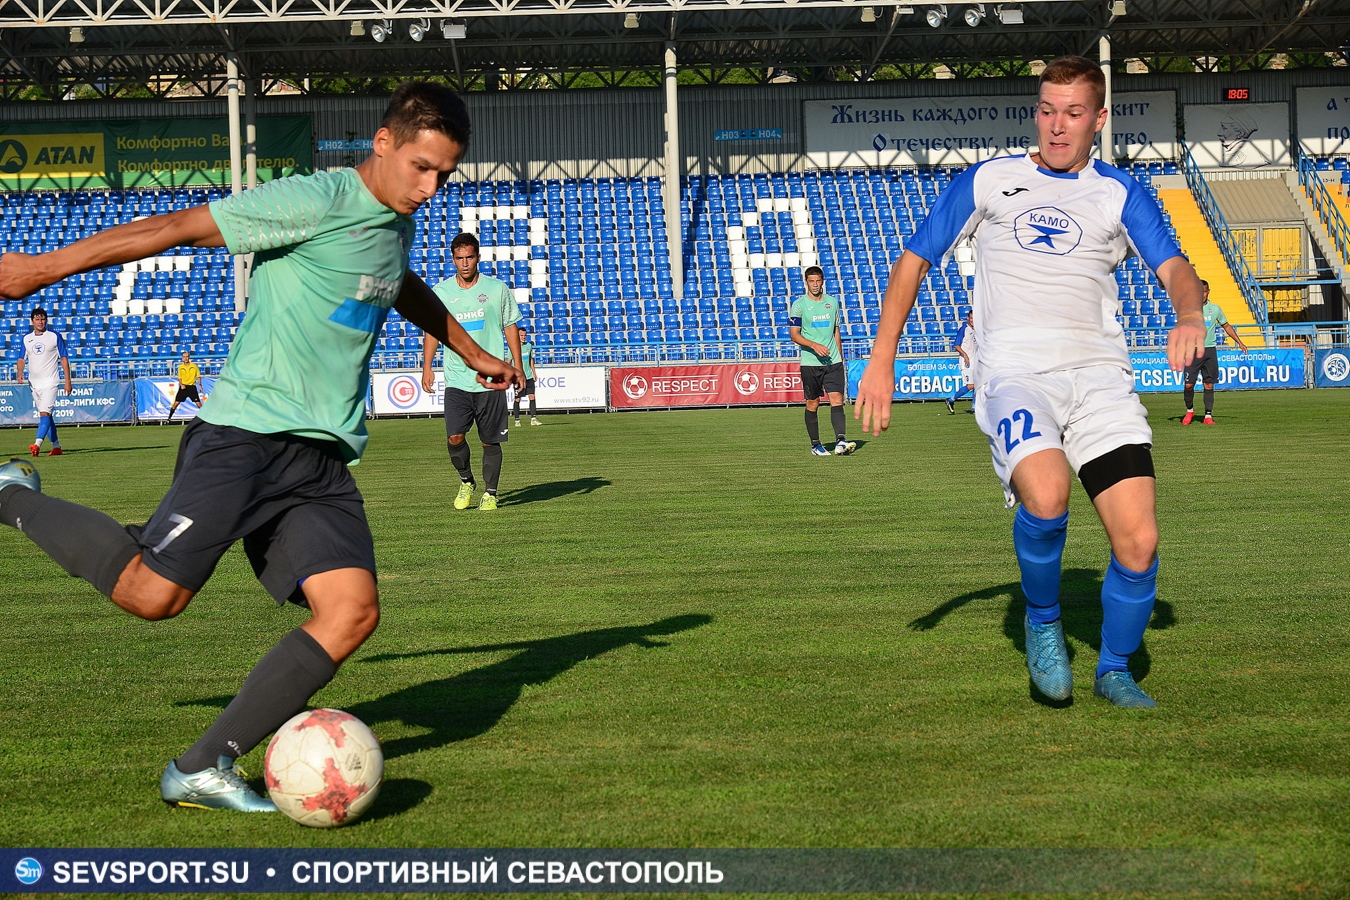 10082019 sevcup 33 - Кубок города по футболу остается у «Черноморца»